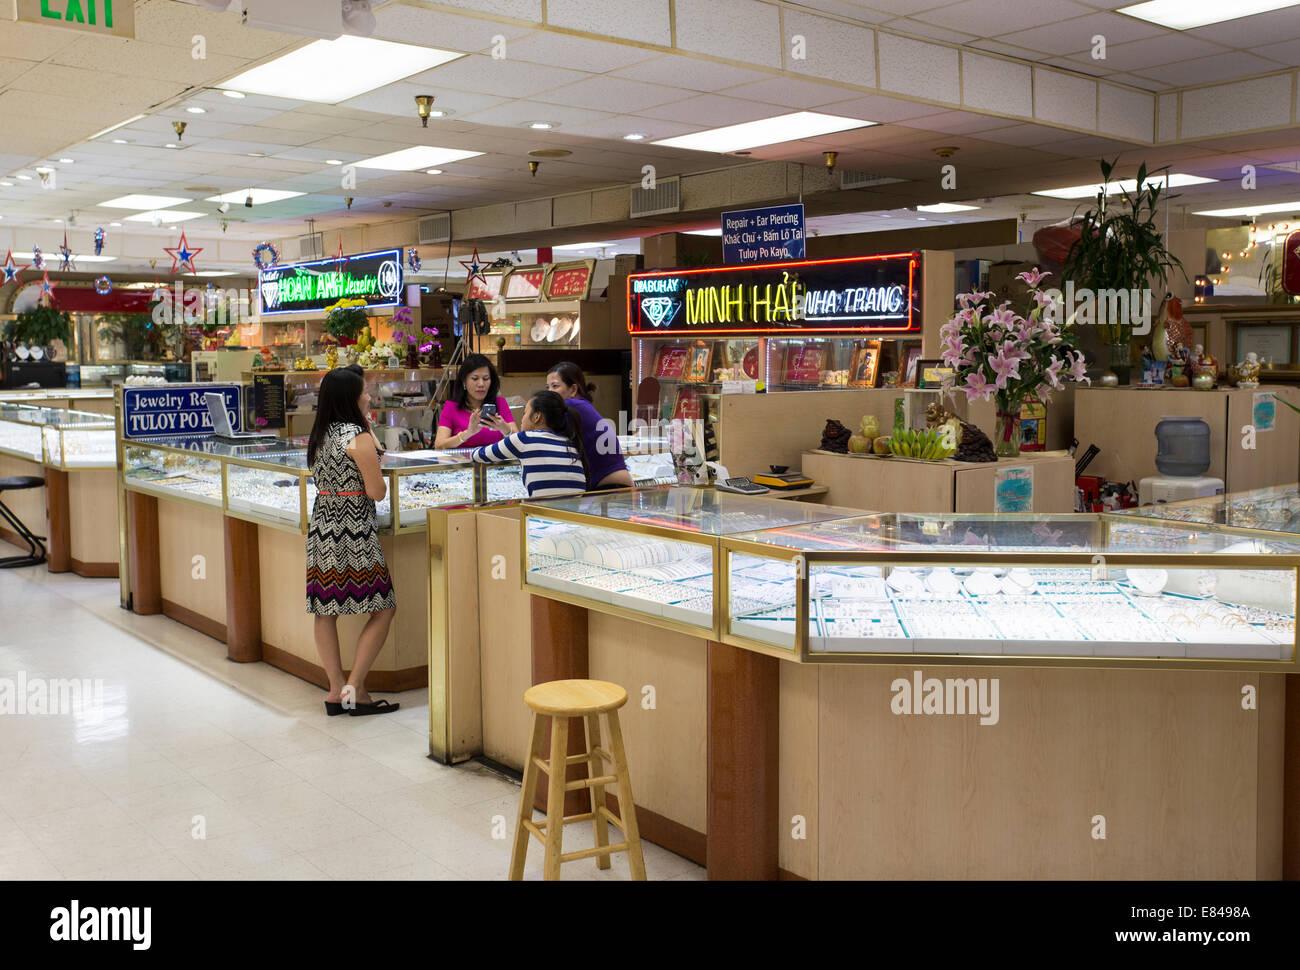 08db59a3f4a Asian Garden Mall Stock Photos   Asian Garden Mall Stock Images - Alamy